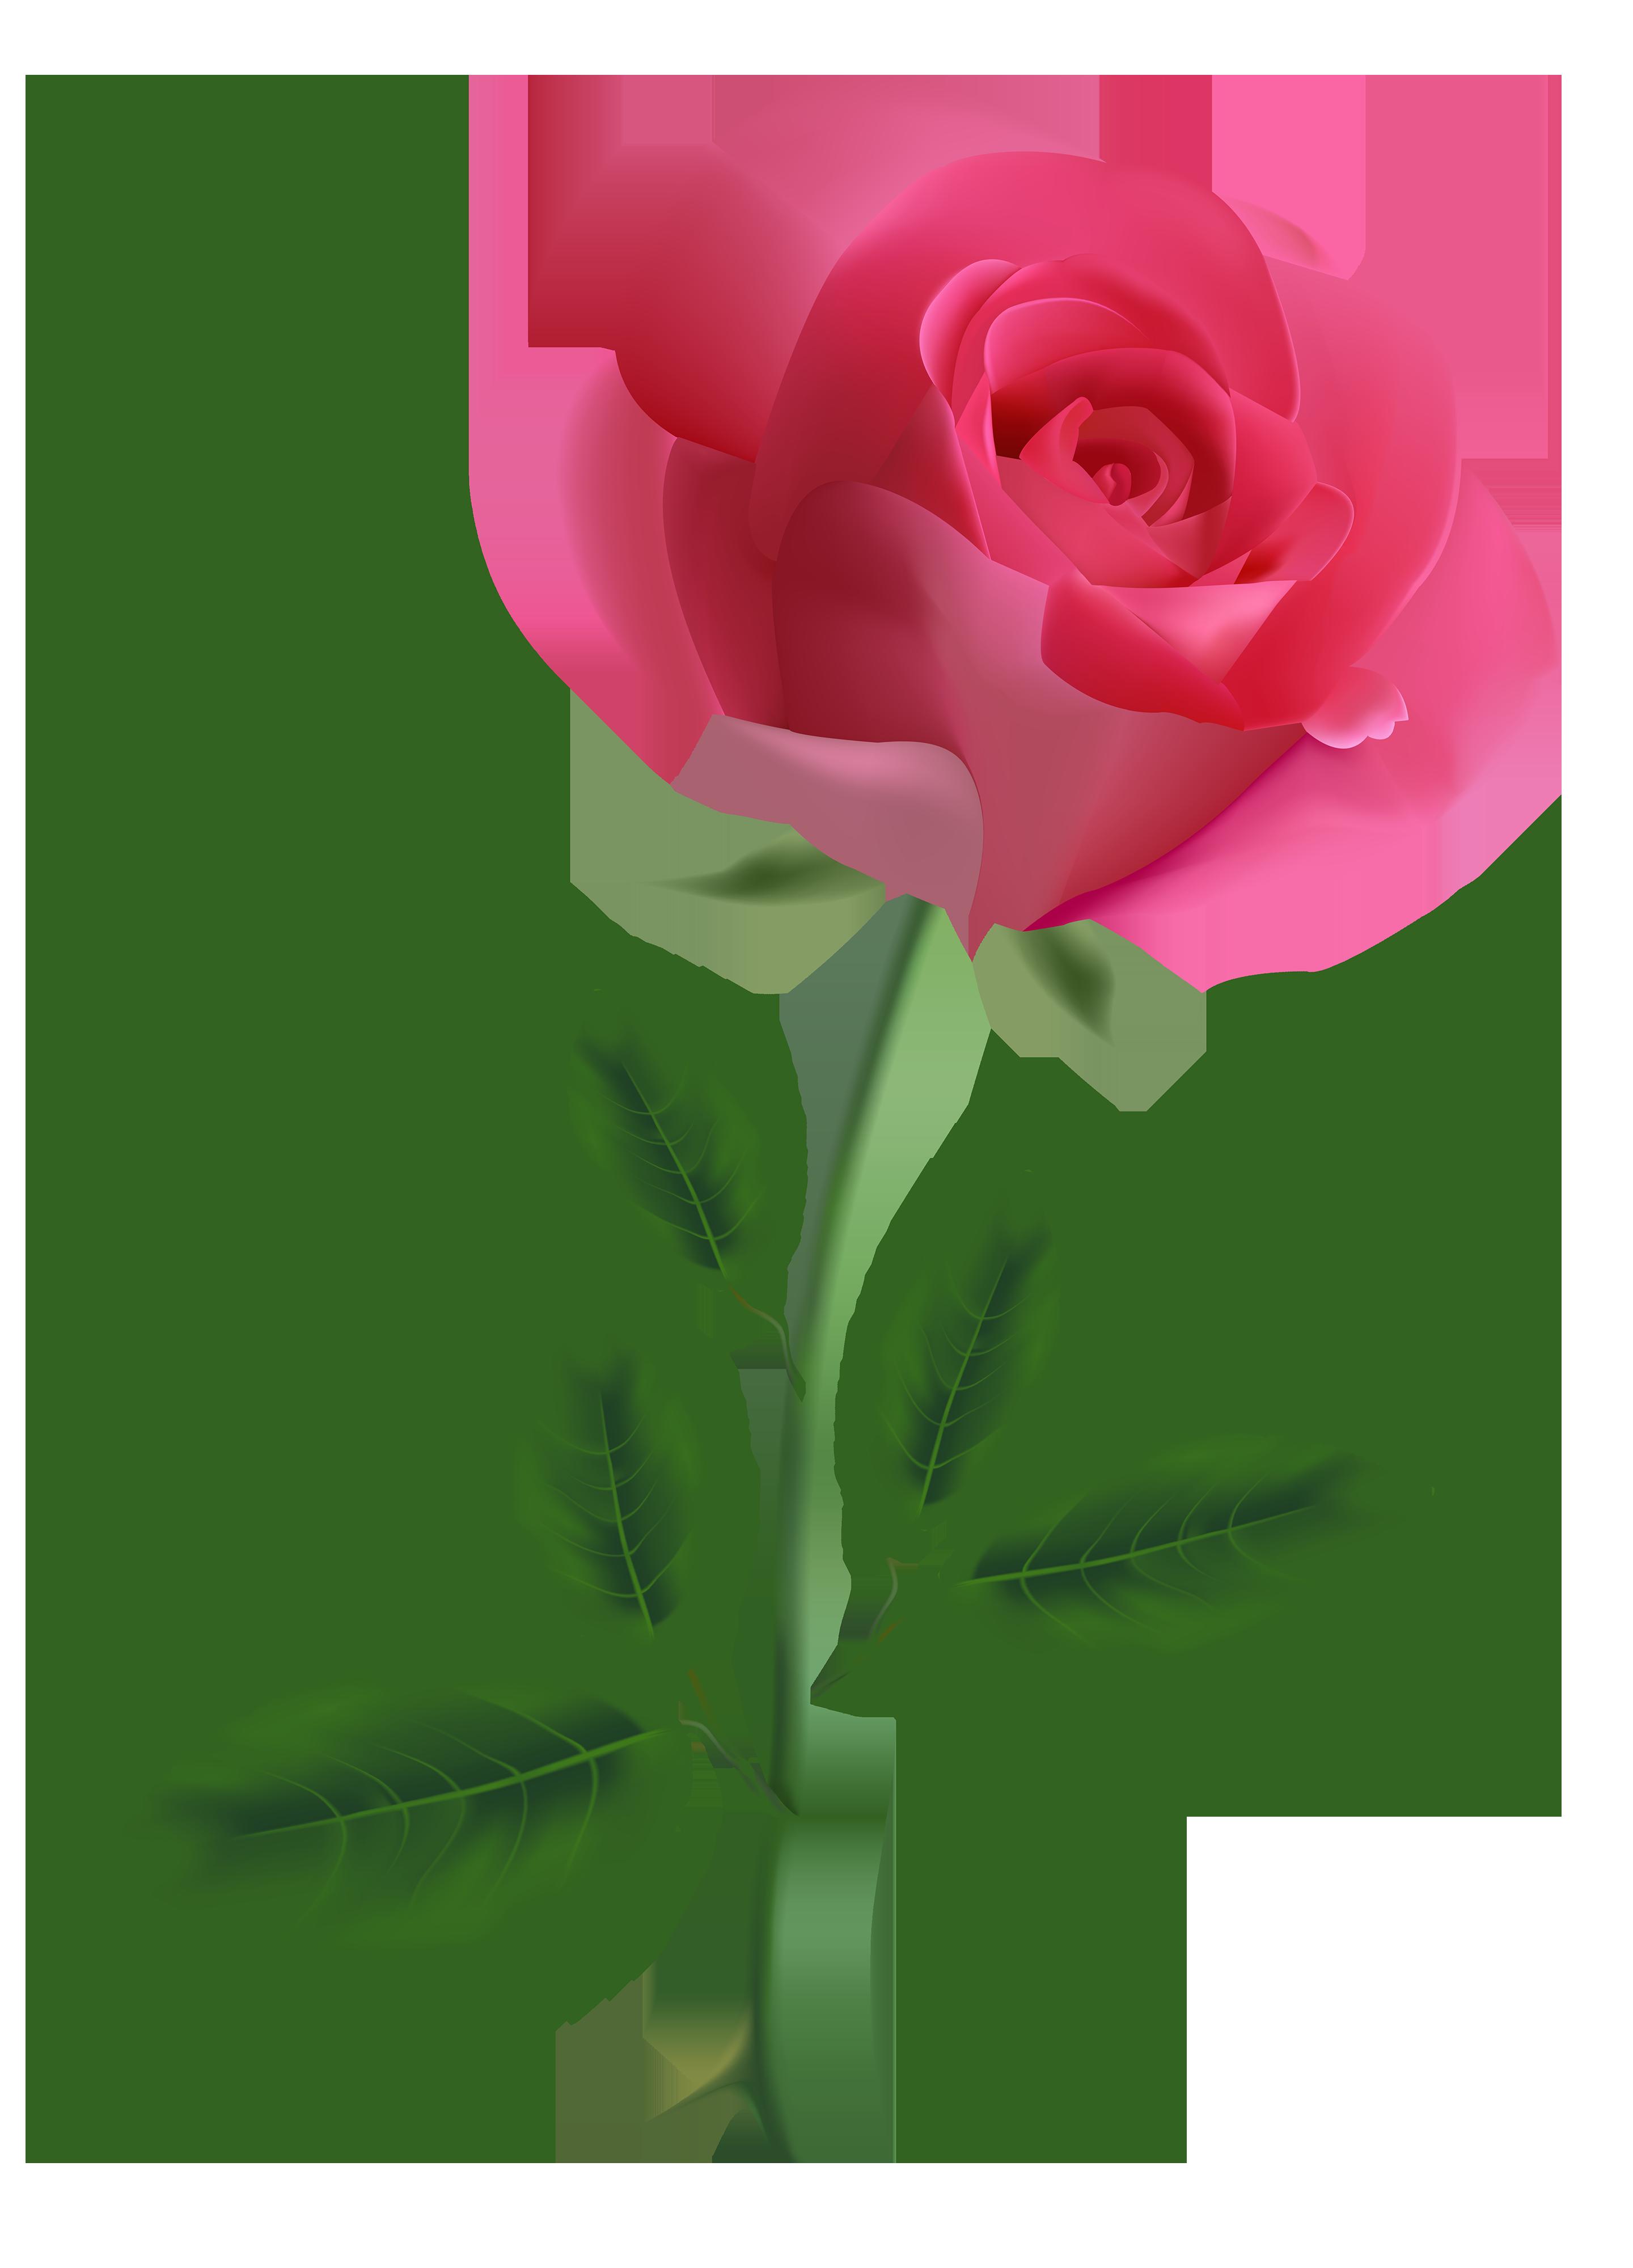 Rose clipart cross. Pink png image design